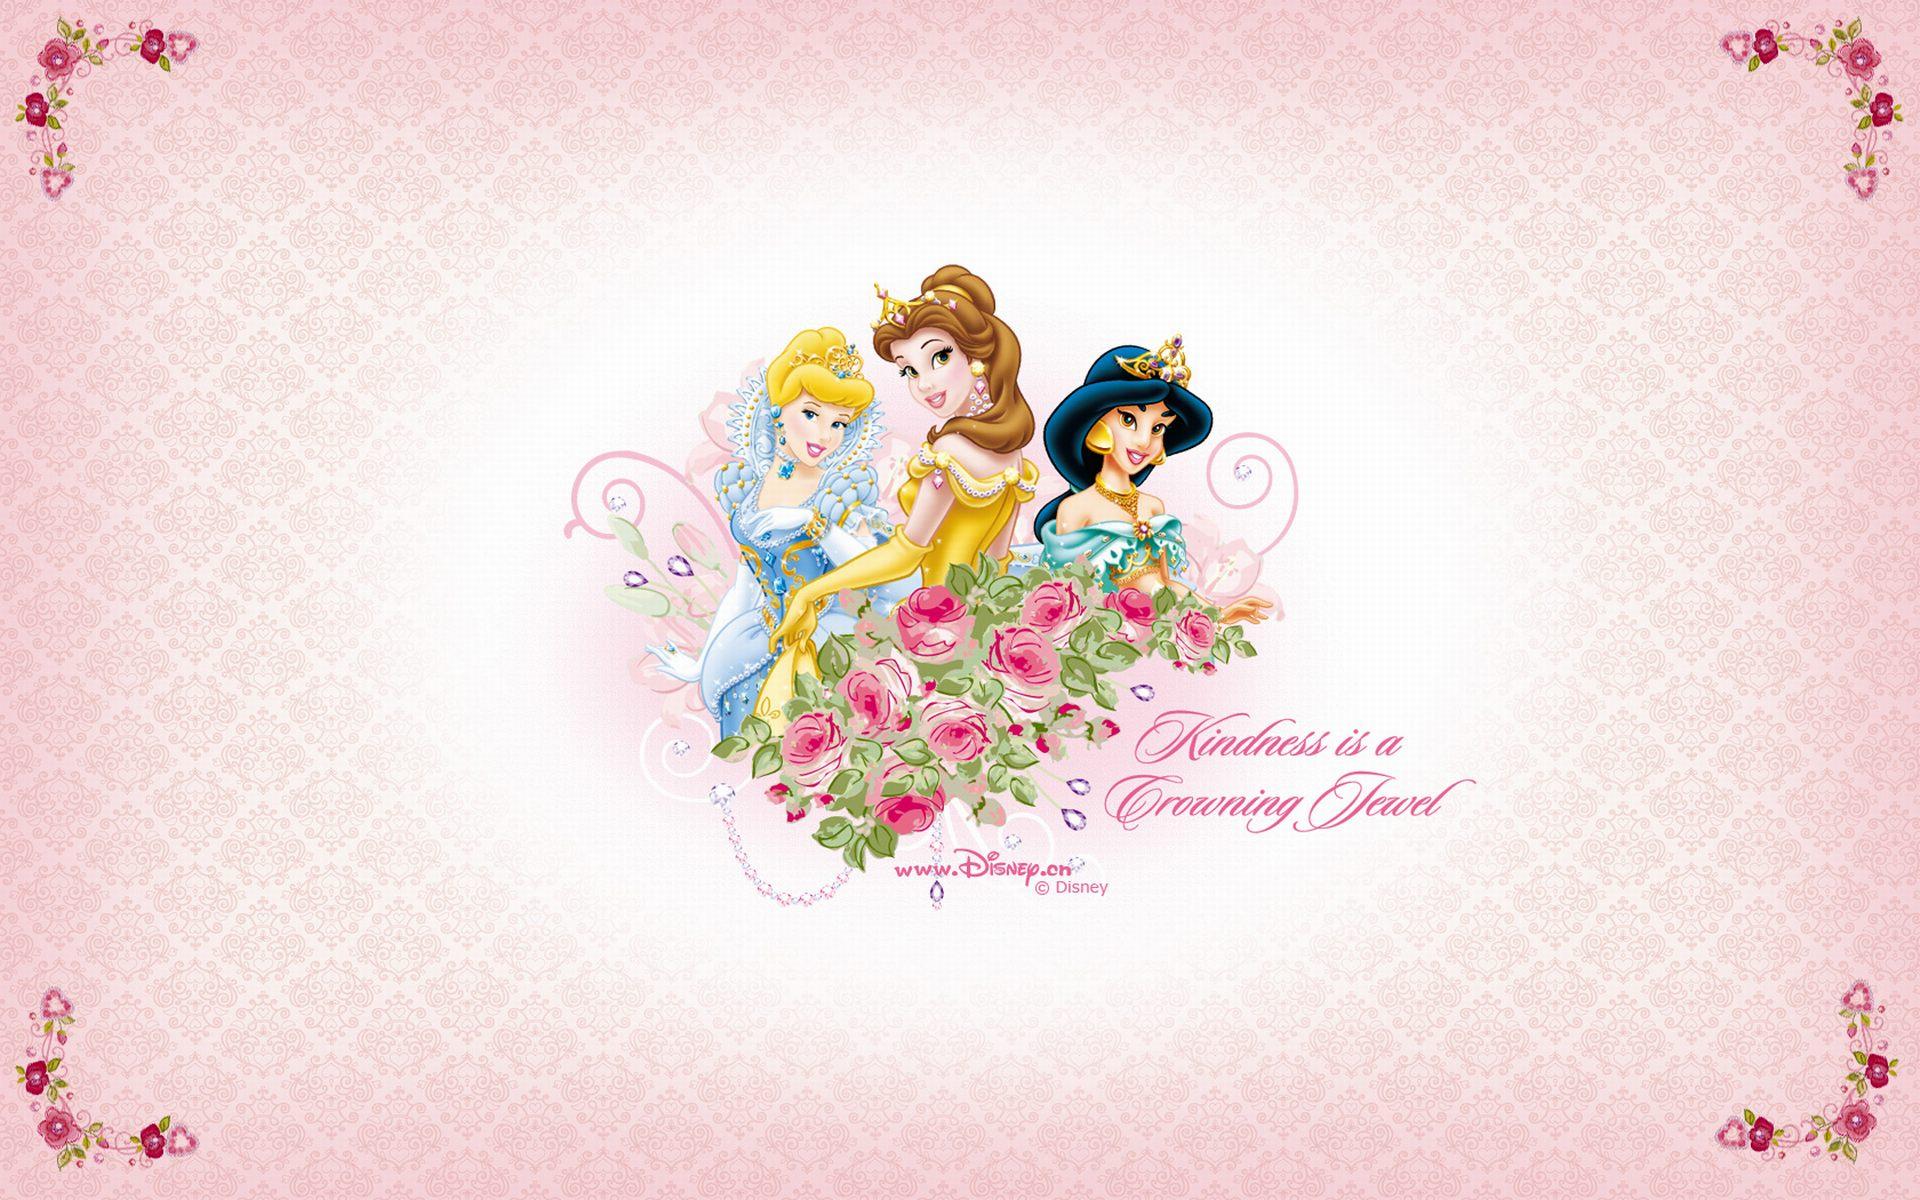 Princesas disney fondos disney princess wallpapers - Images princesse ...